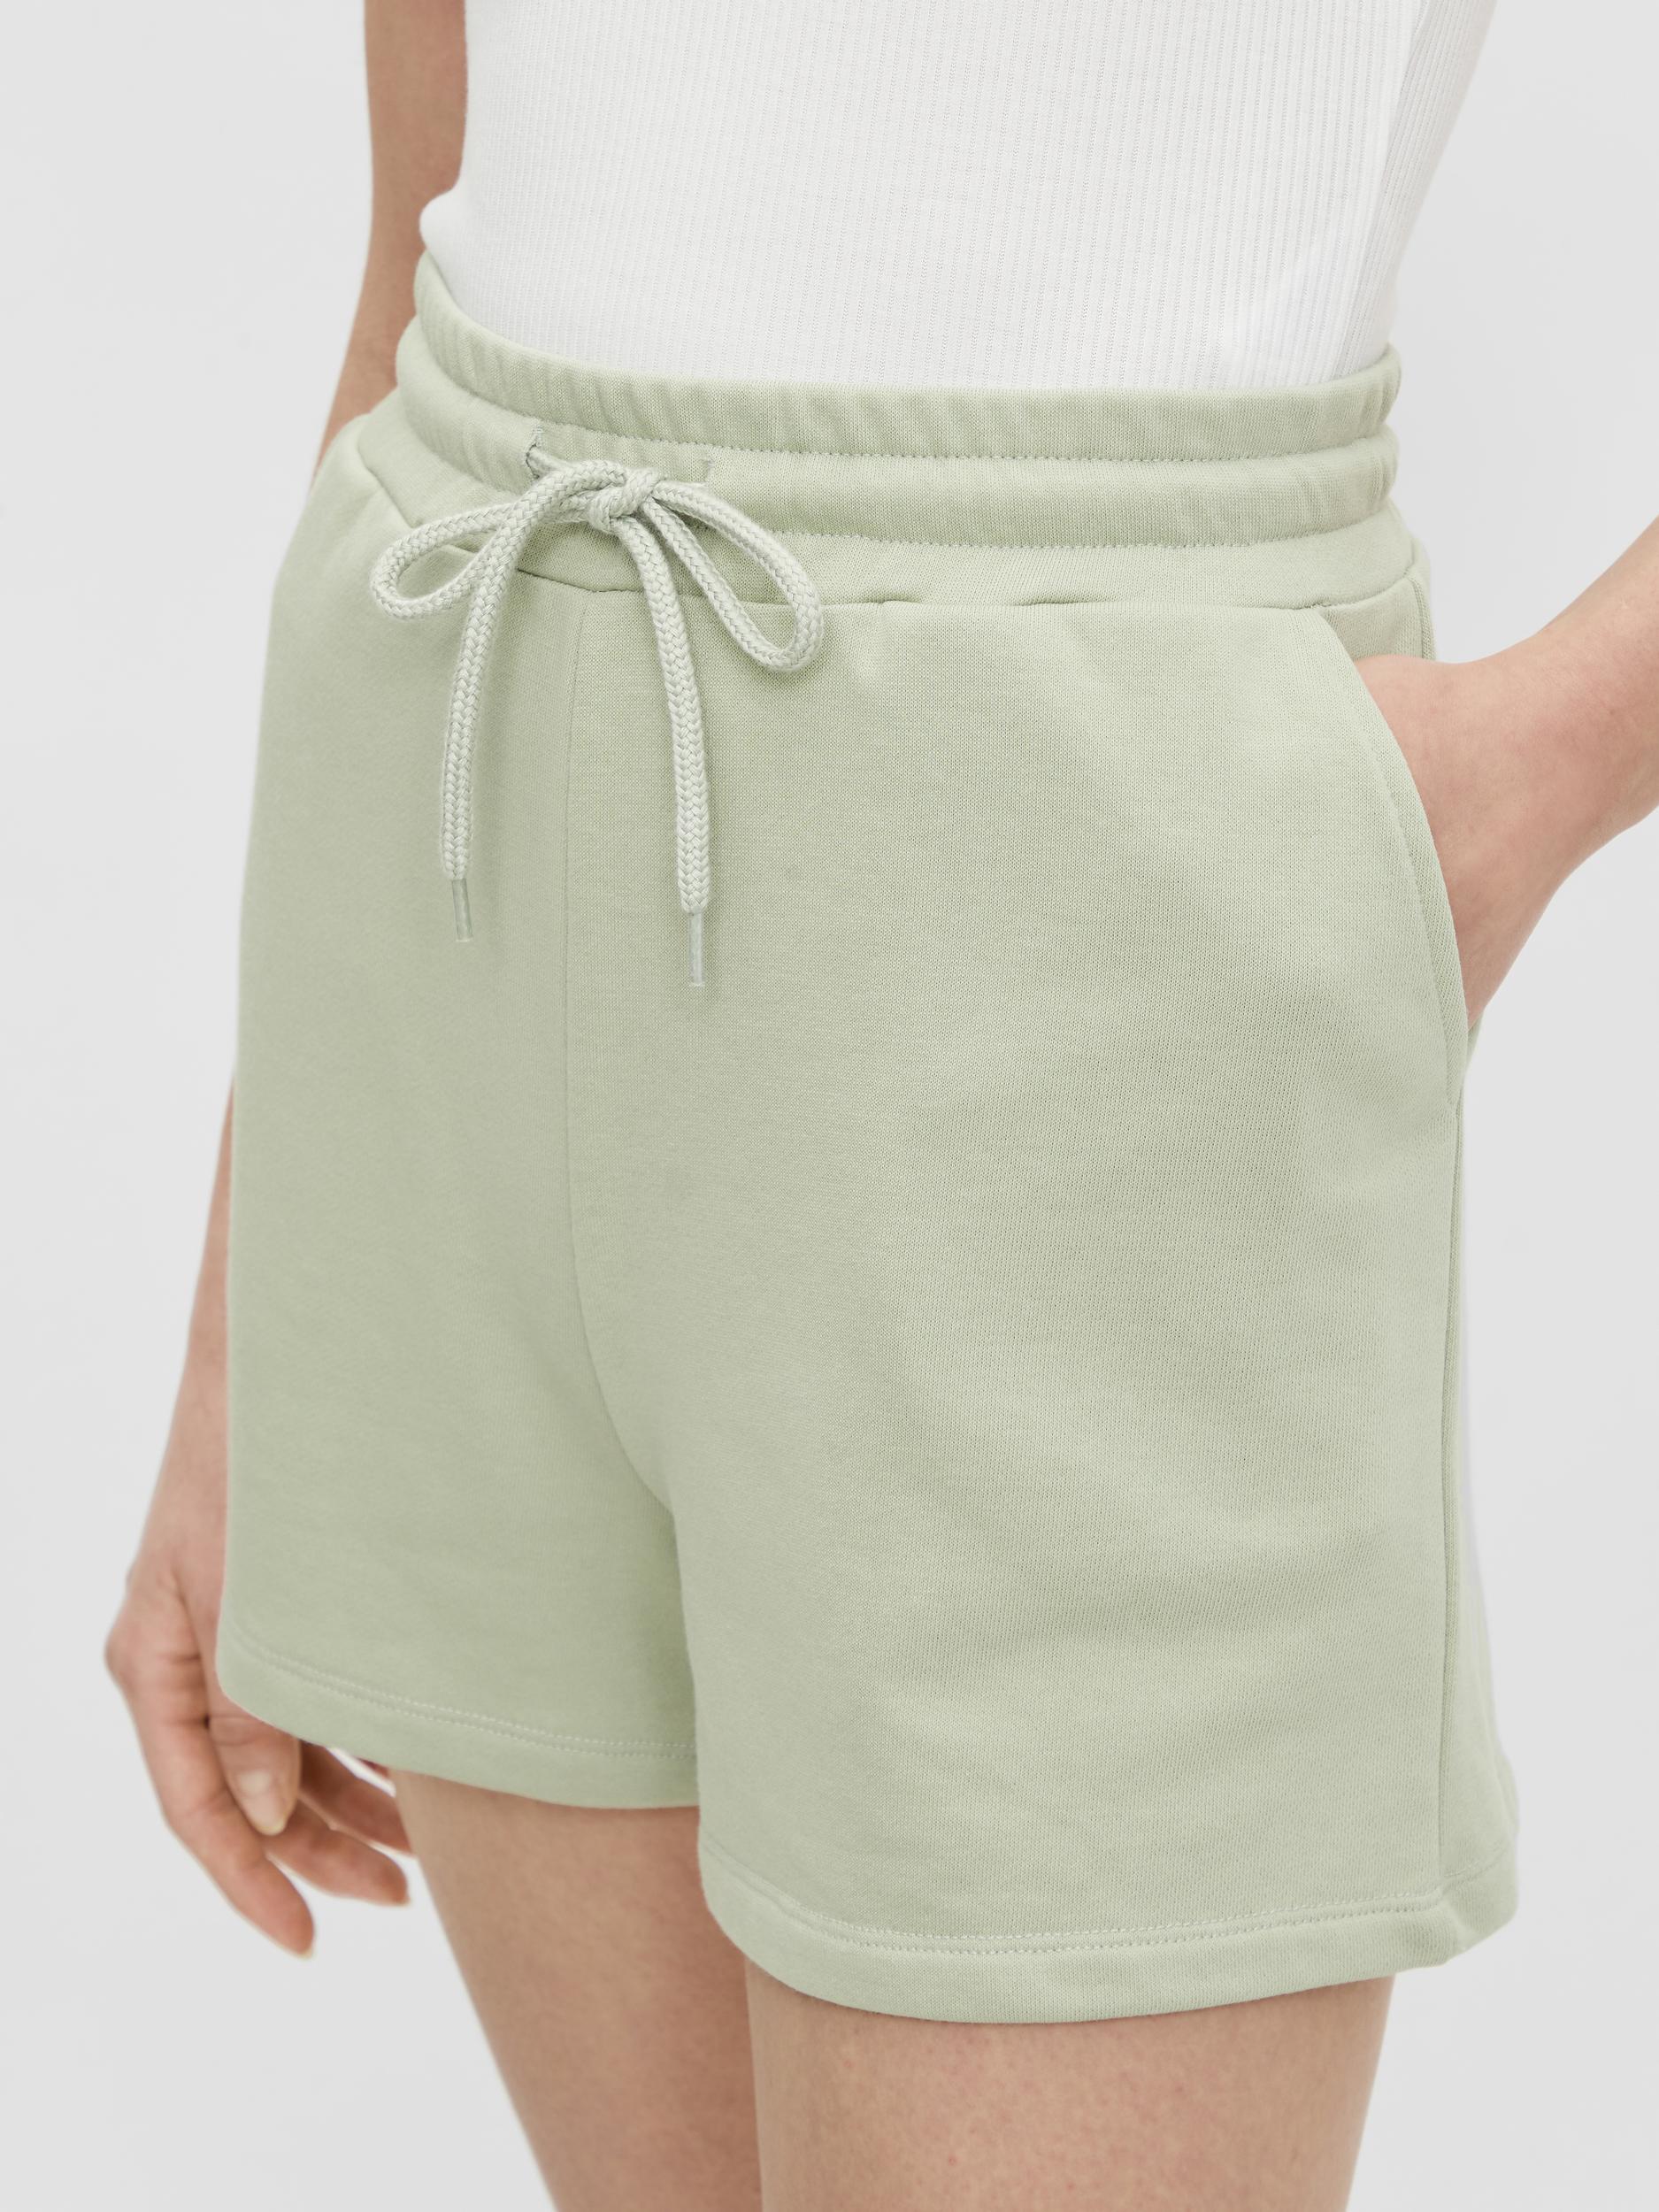 Pieces Chilli Summer shorts, desert sage, large